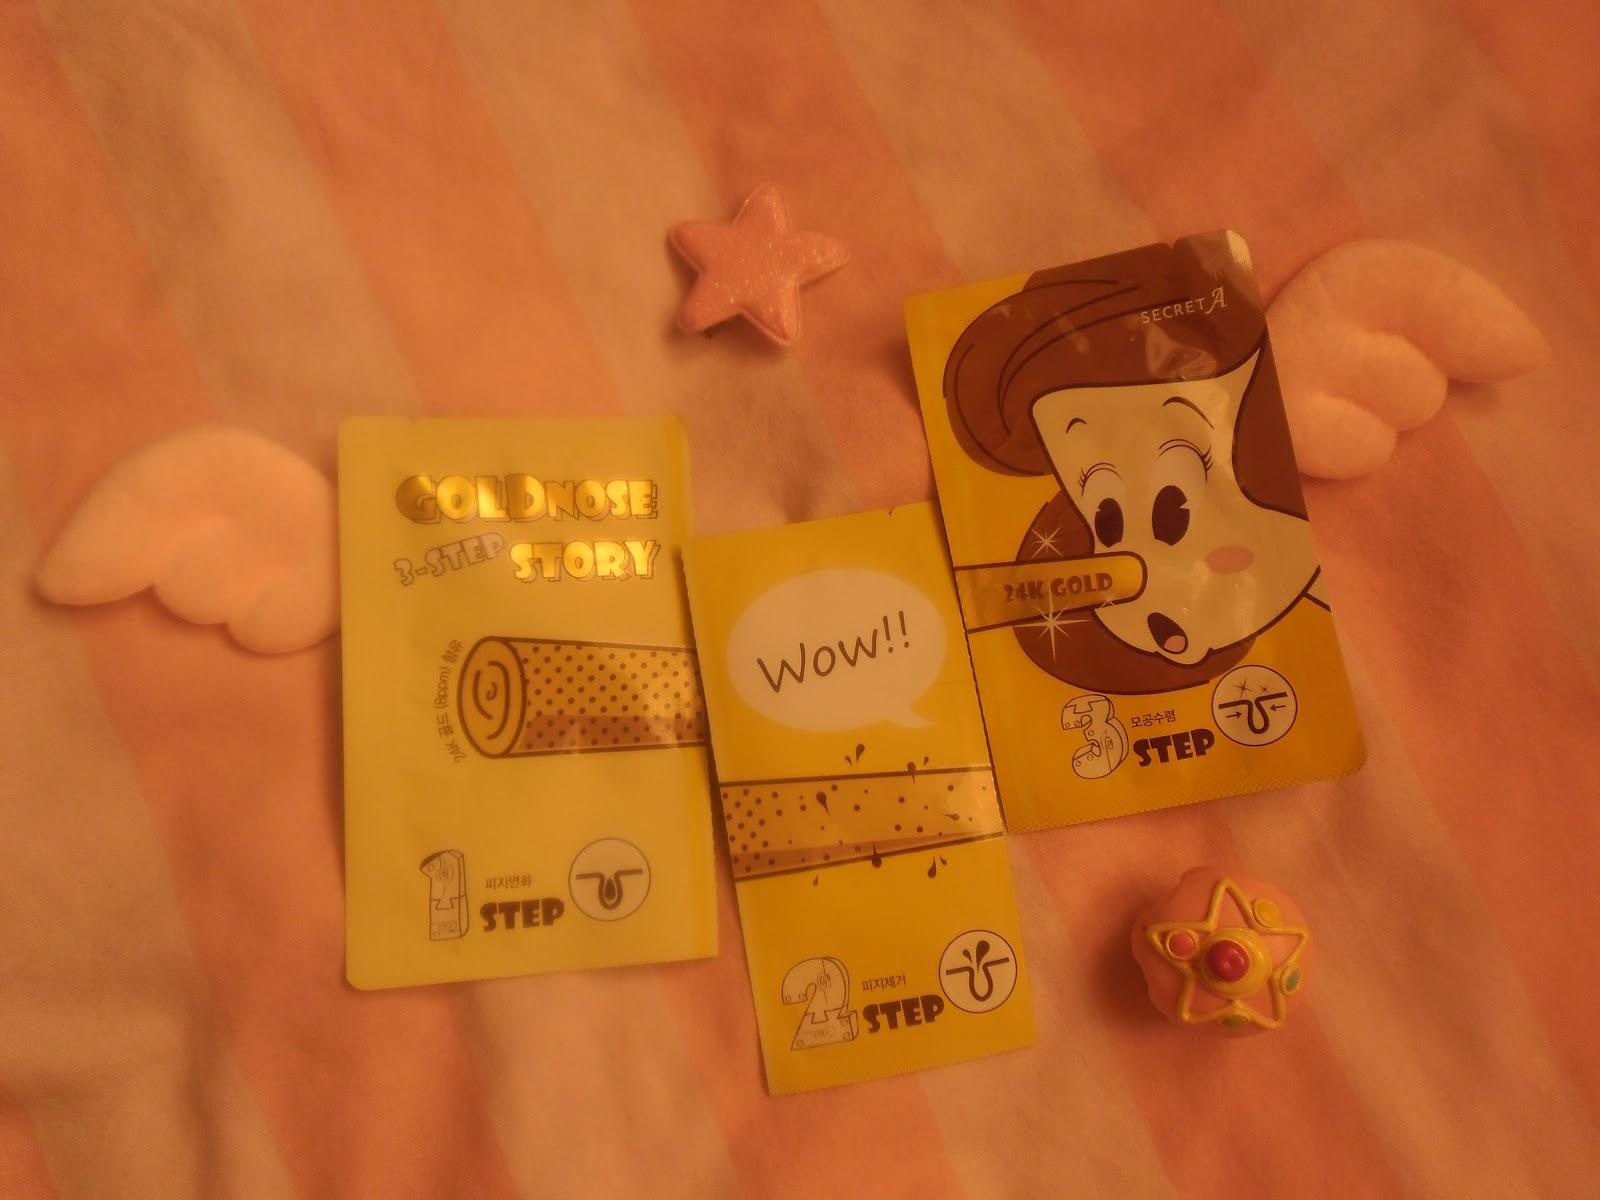 Unikitty Korean Beauty Secret A Goldnose 3 Step Story Key Nature Recipe Mask Pack Tea Tree 20g 3pcs Nose Strip